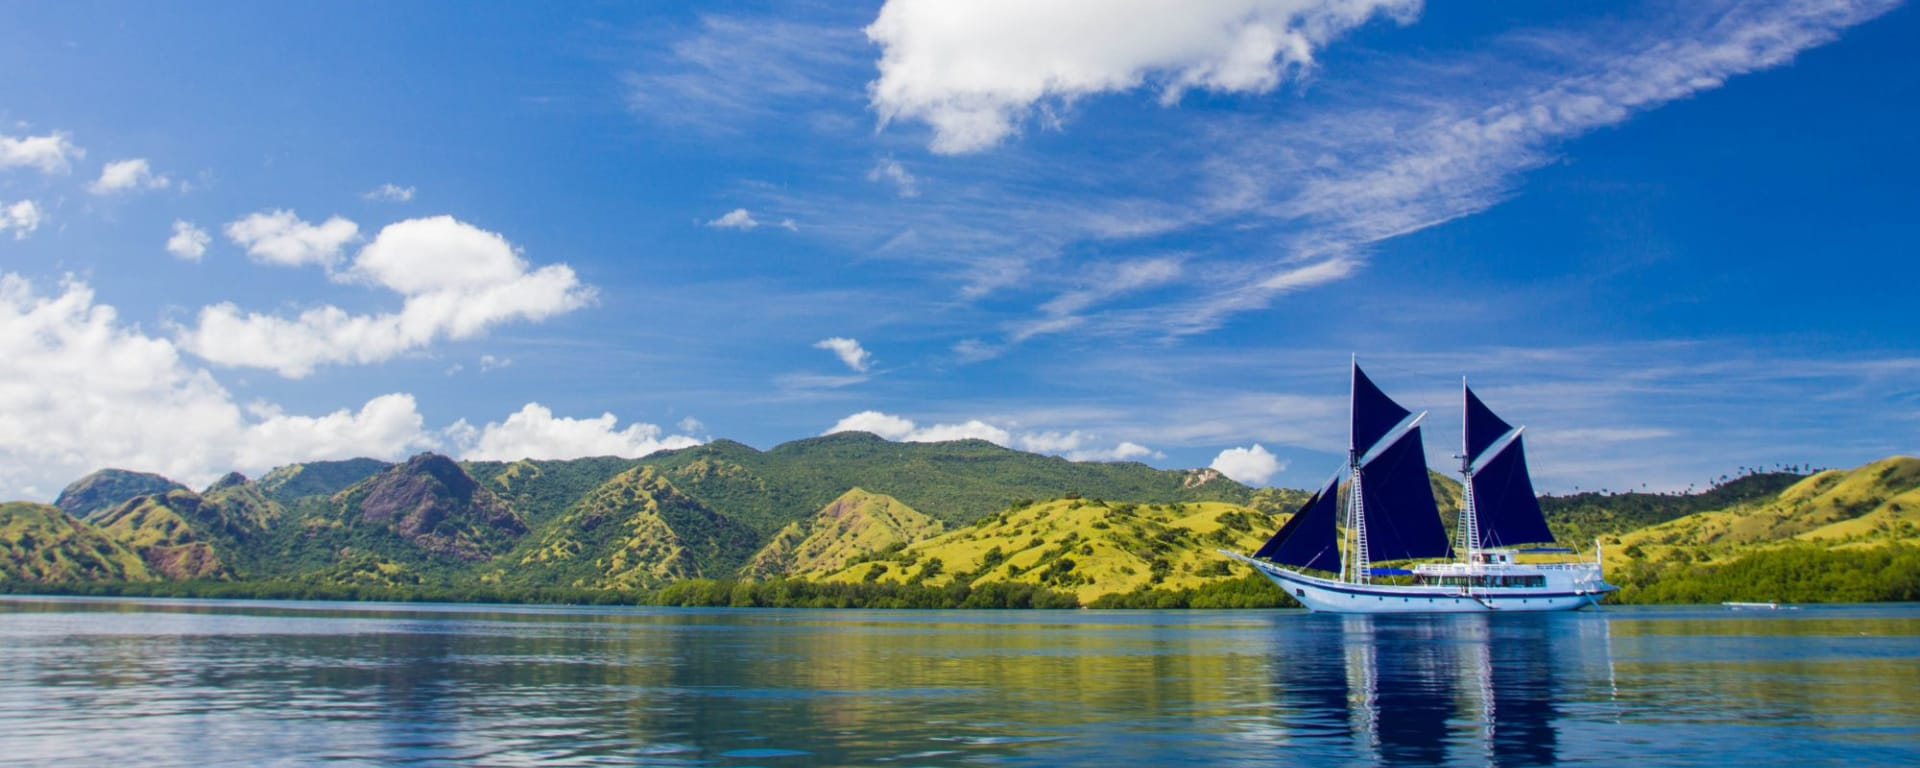 Kreuzfahrt im Inselparadies Raja Ampat ab Sorong: Ombak Putih